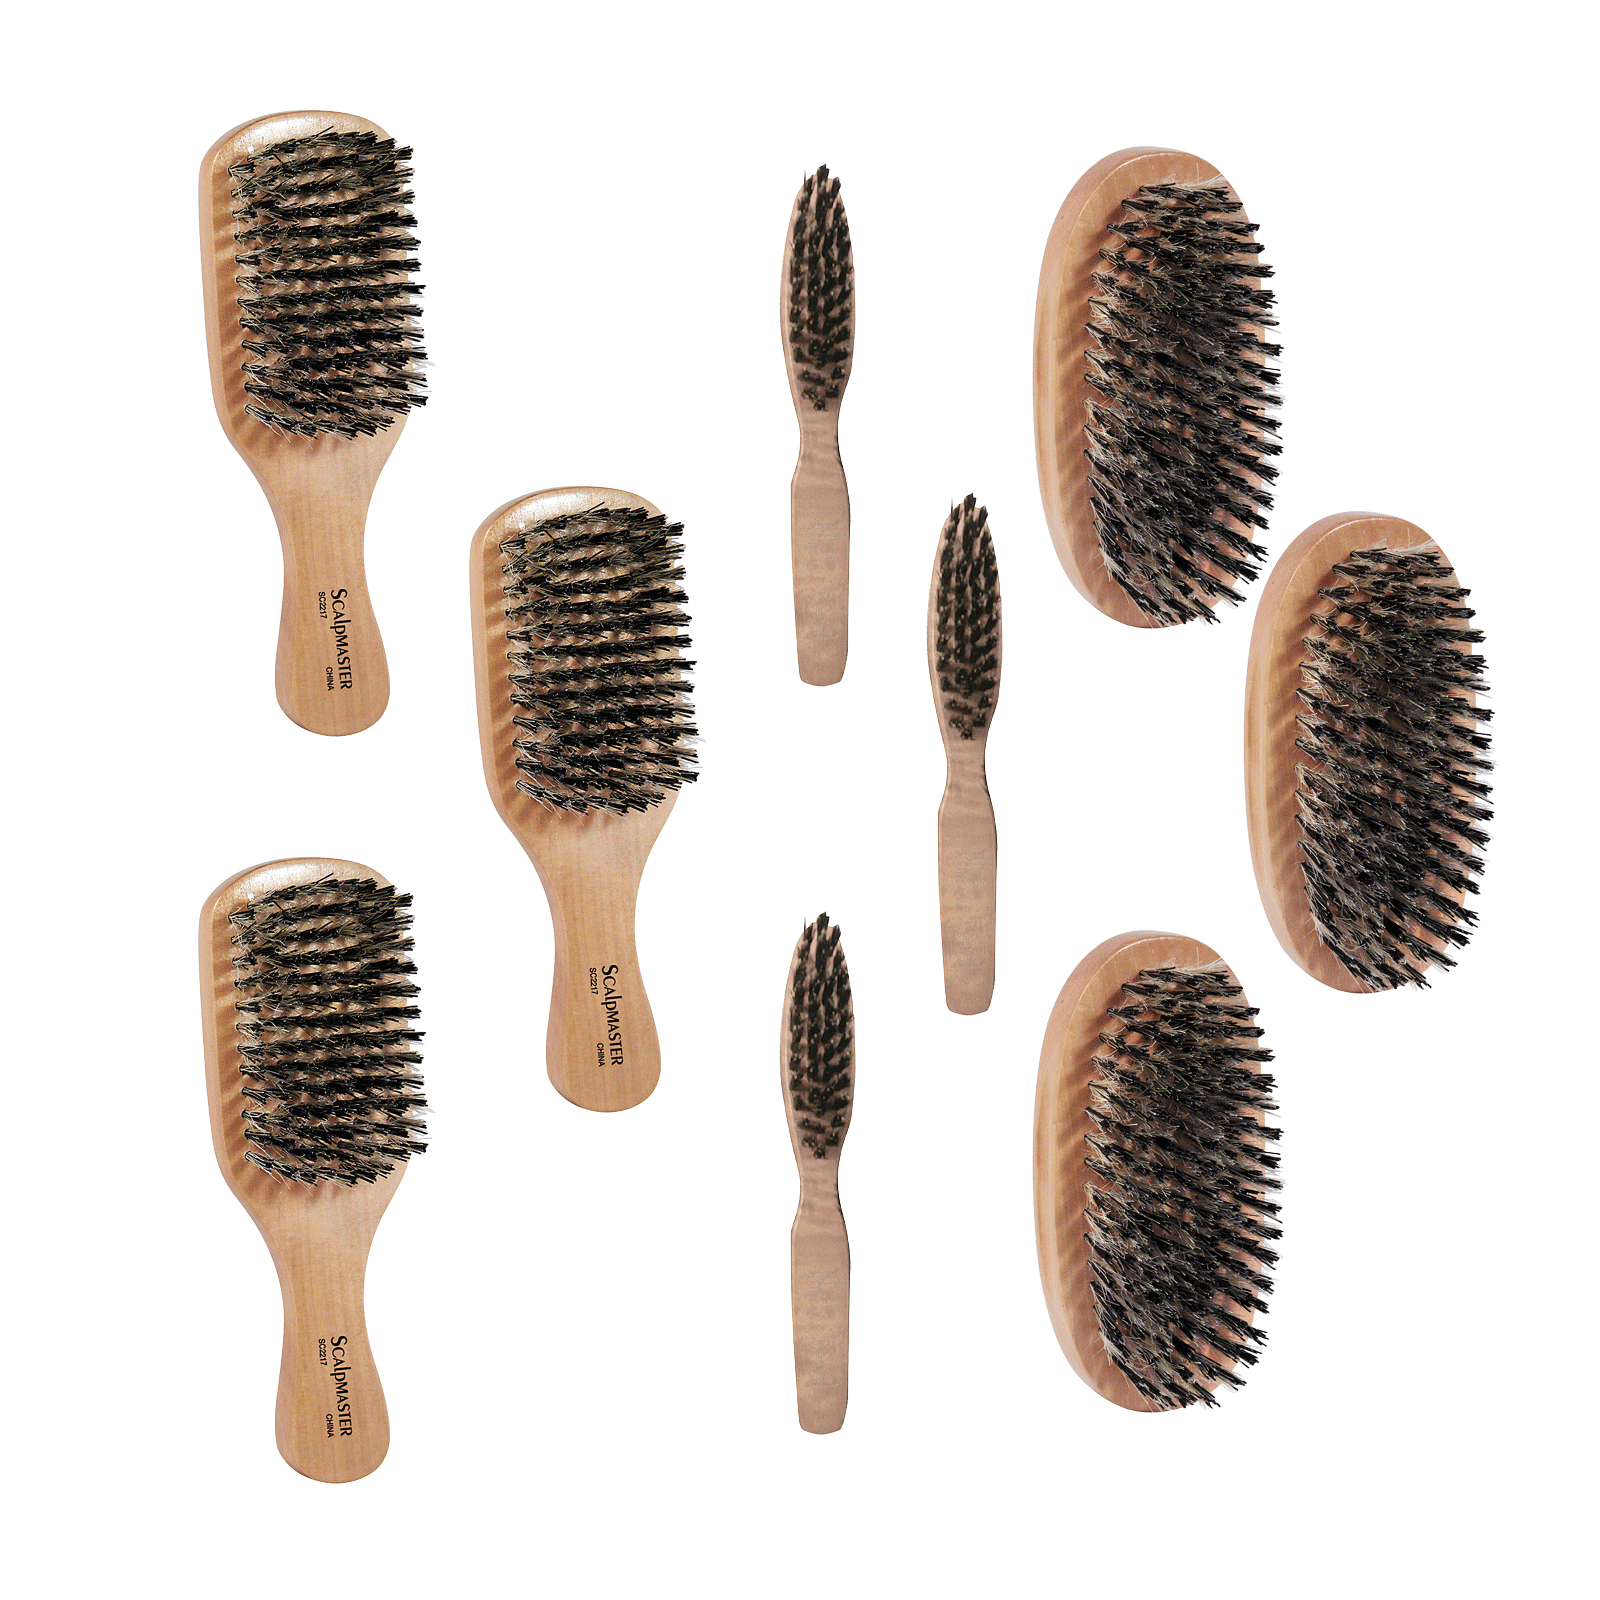 20580050 Brush Professional 50 mm S.58 Boar Brush